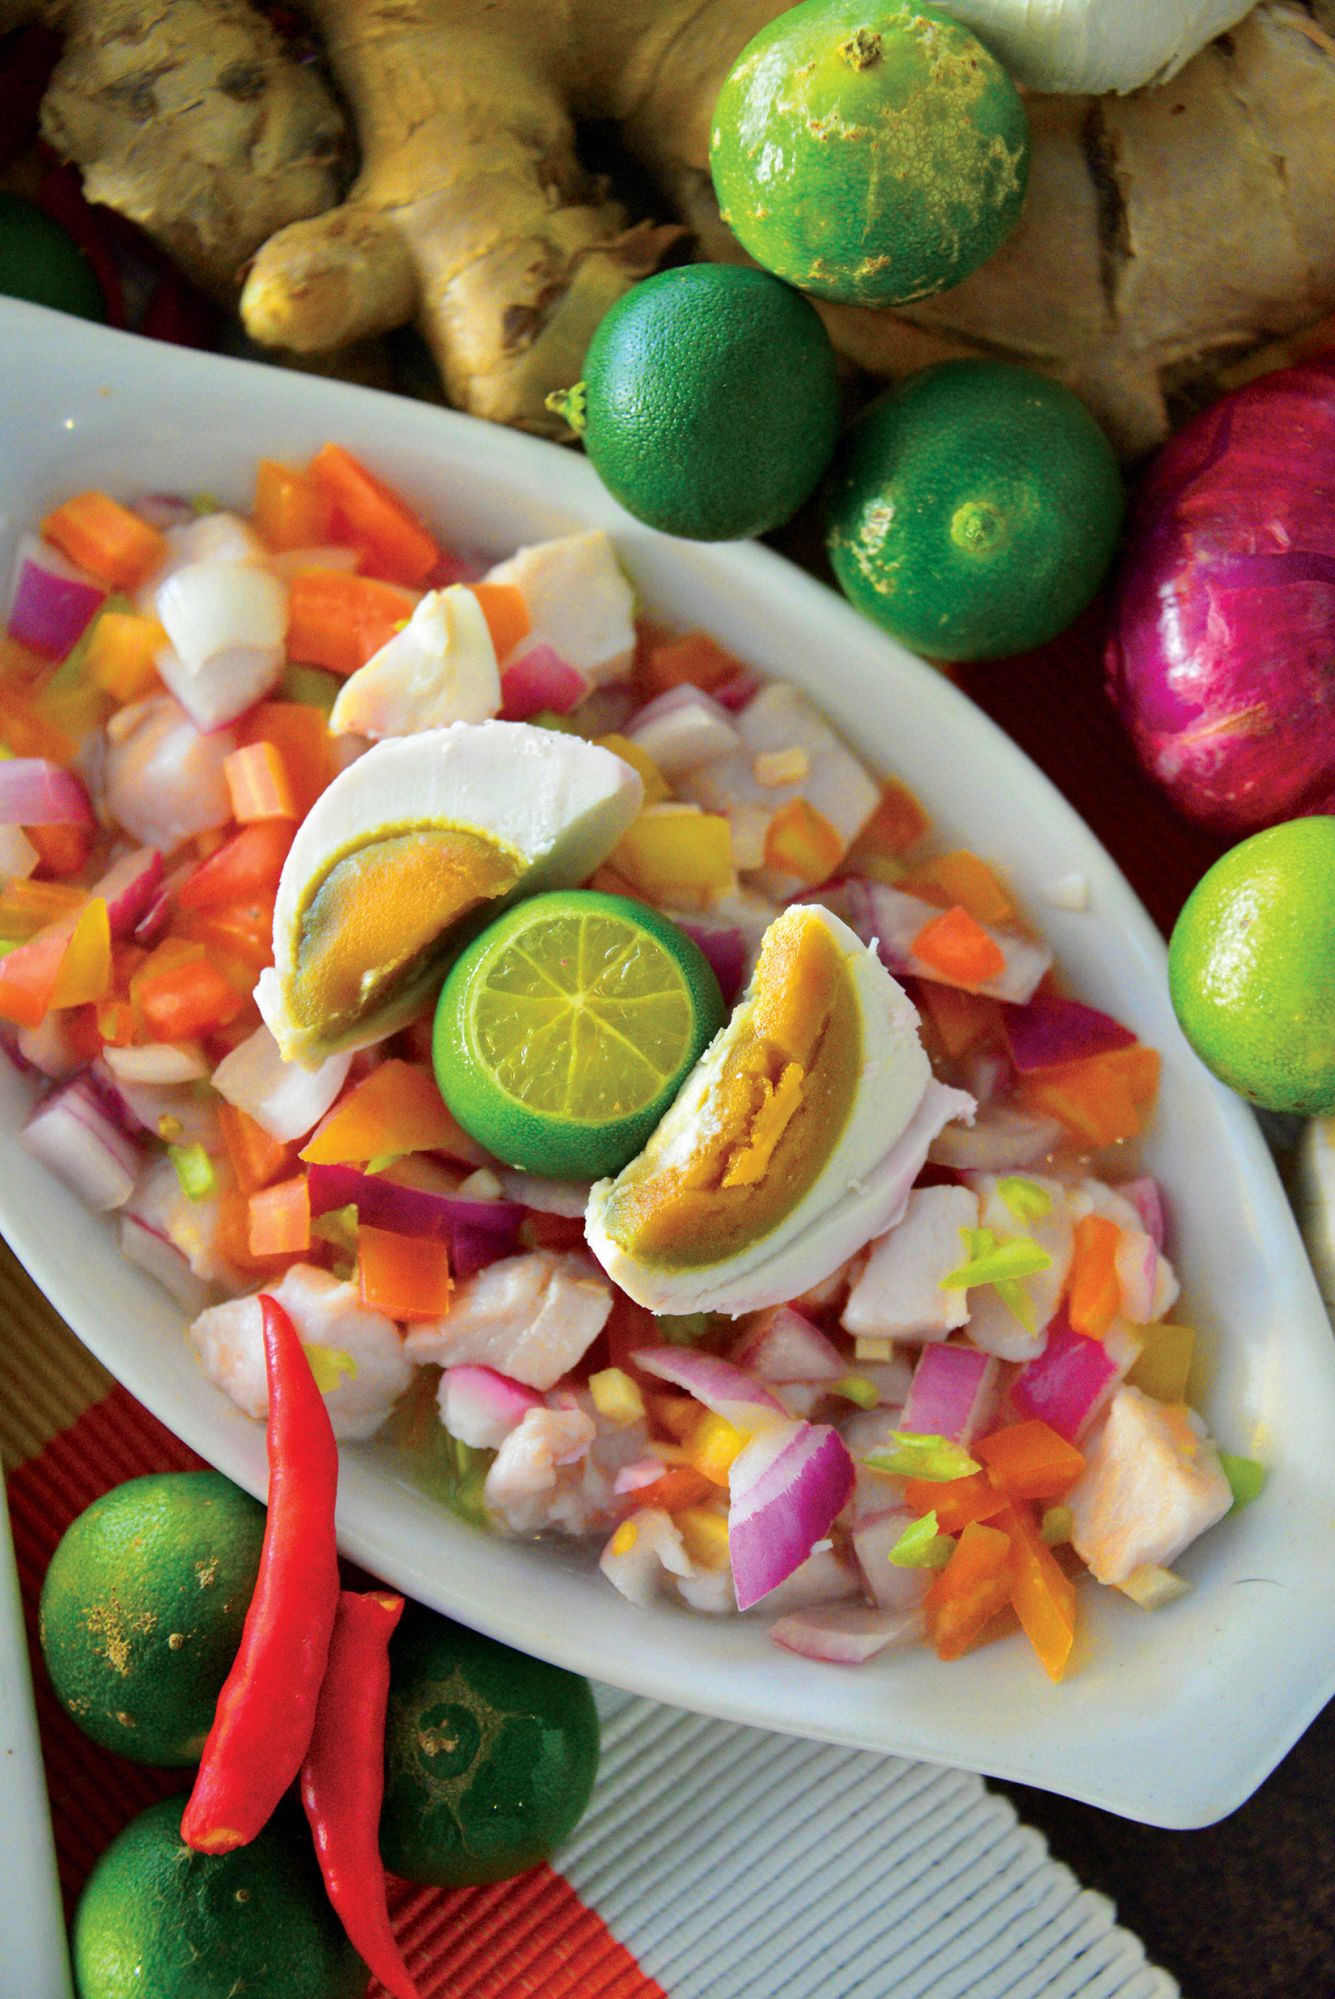 A Gastronomic Journey Through Southern Mindanao | Philippine